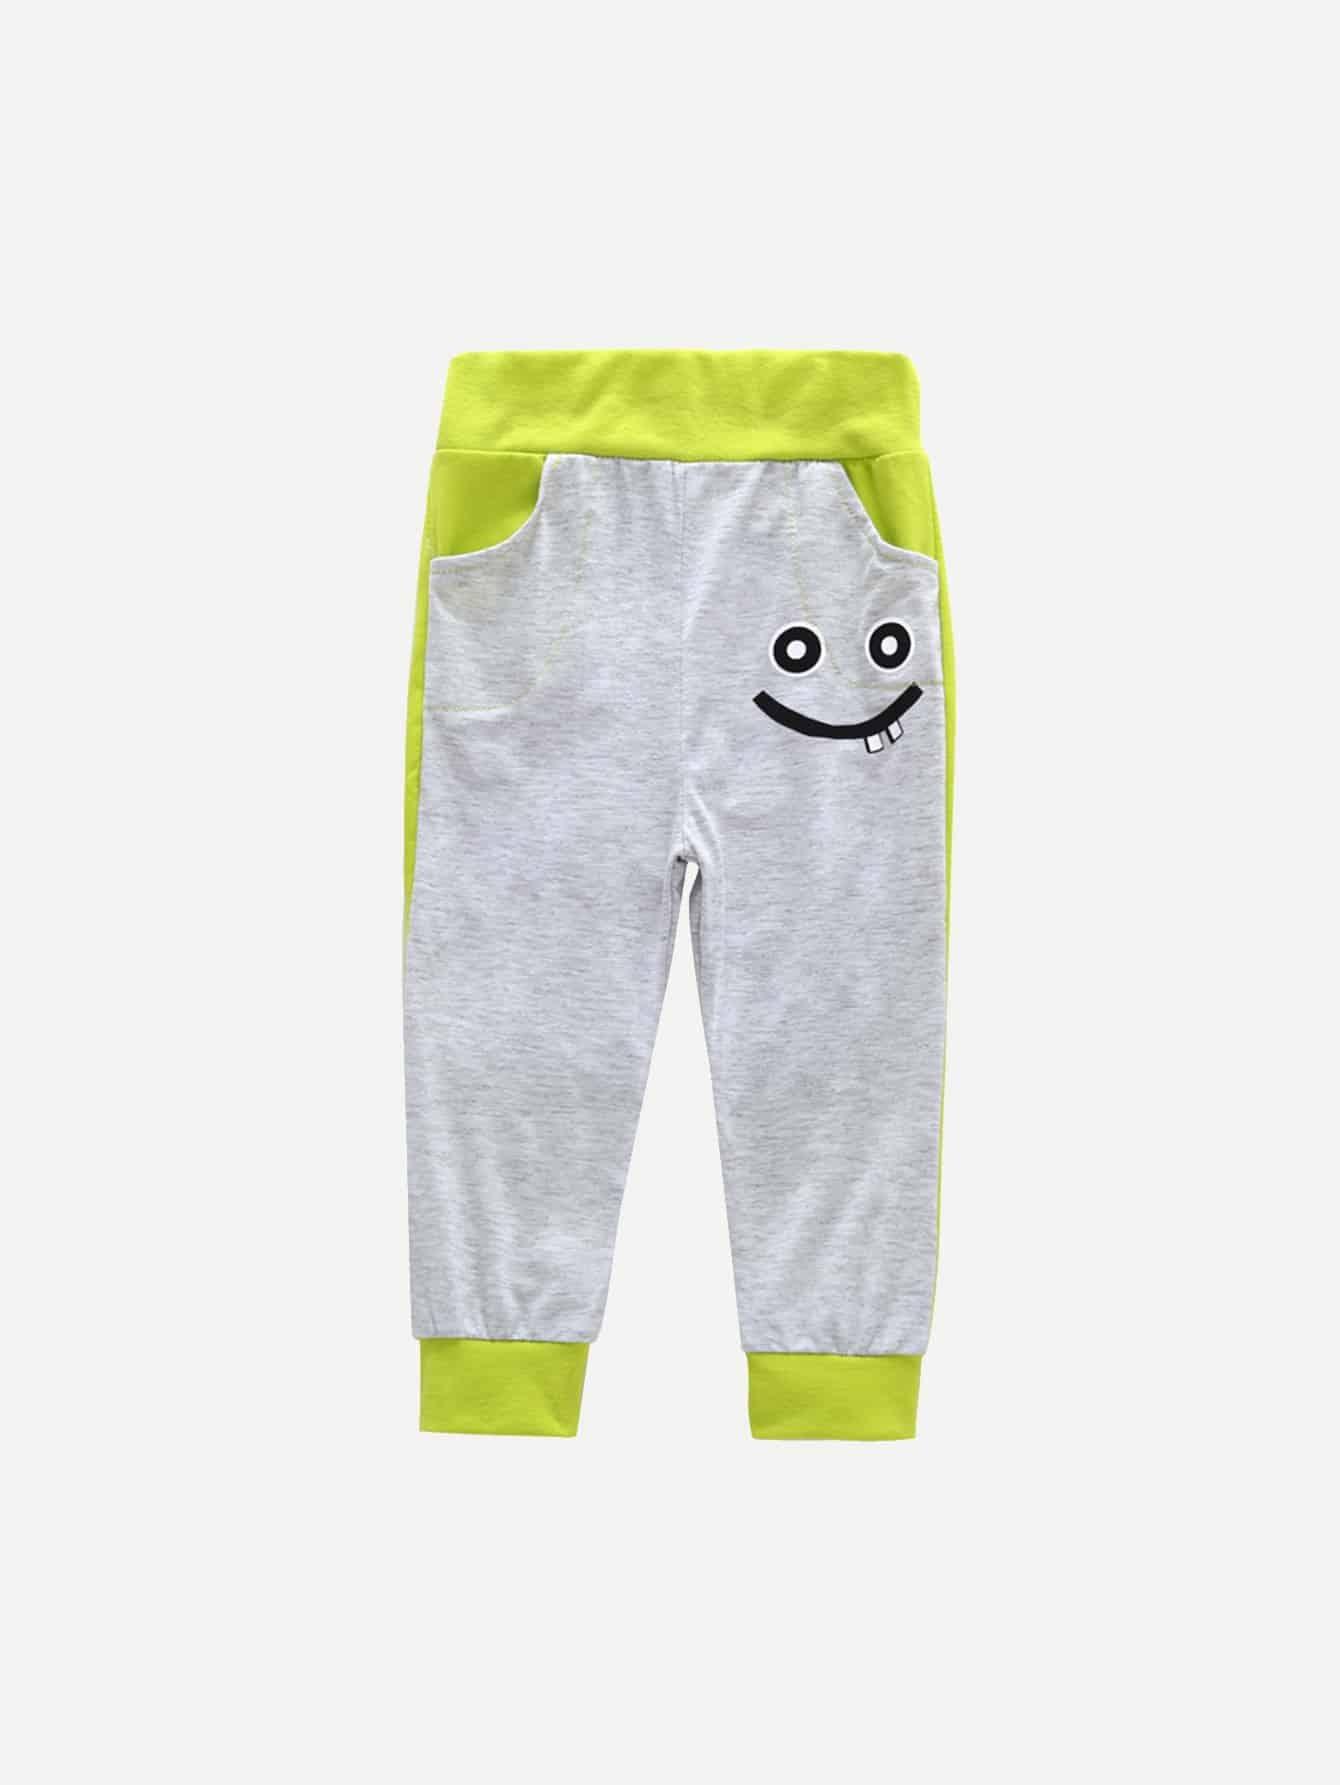 Boys Color Block Cartoon Print Pants